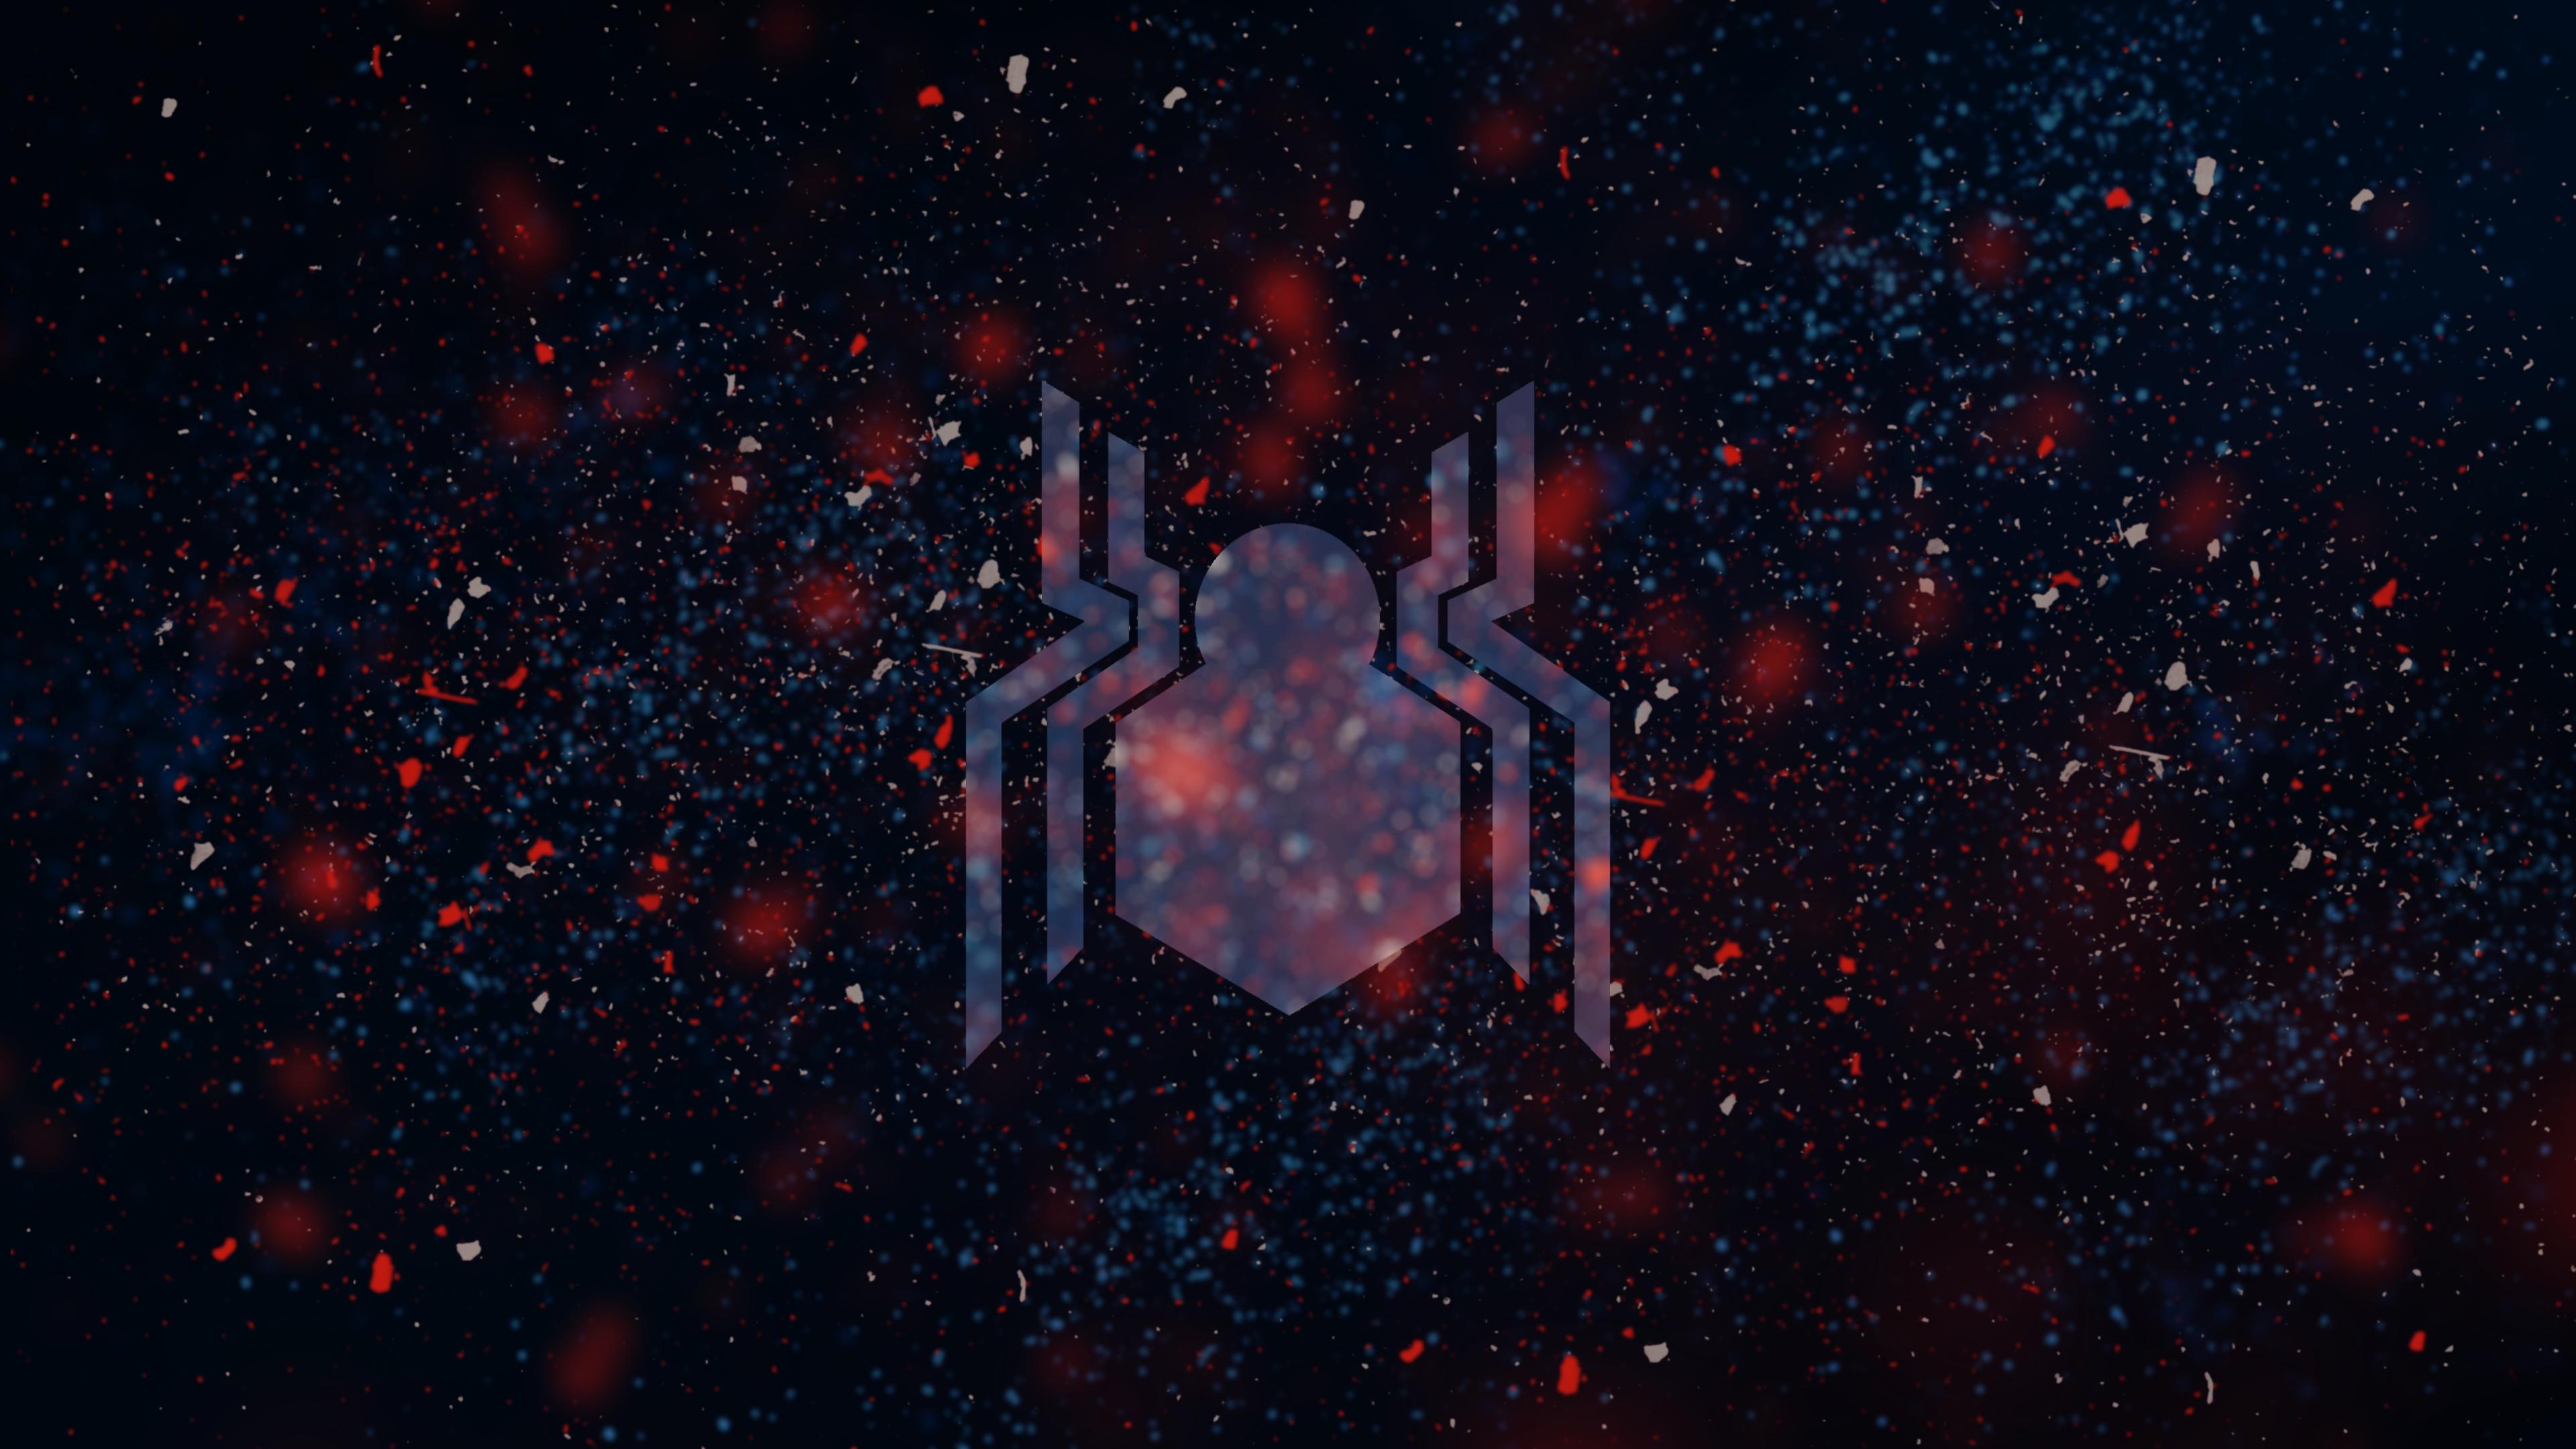 Spider Man Homecoming 4K wallpaper   Imgur 3840x2160